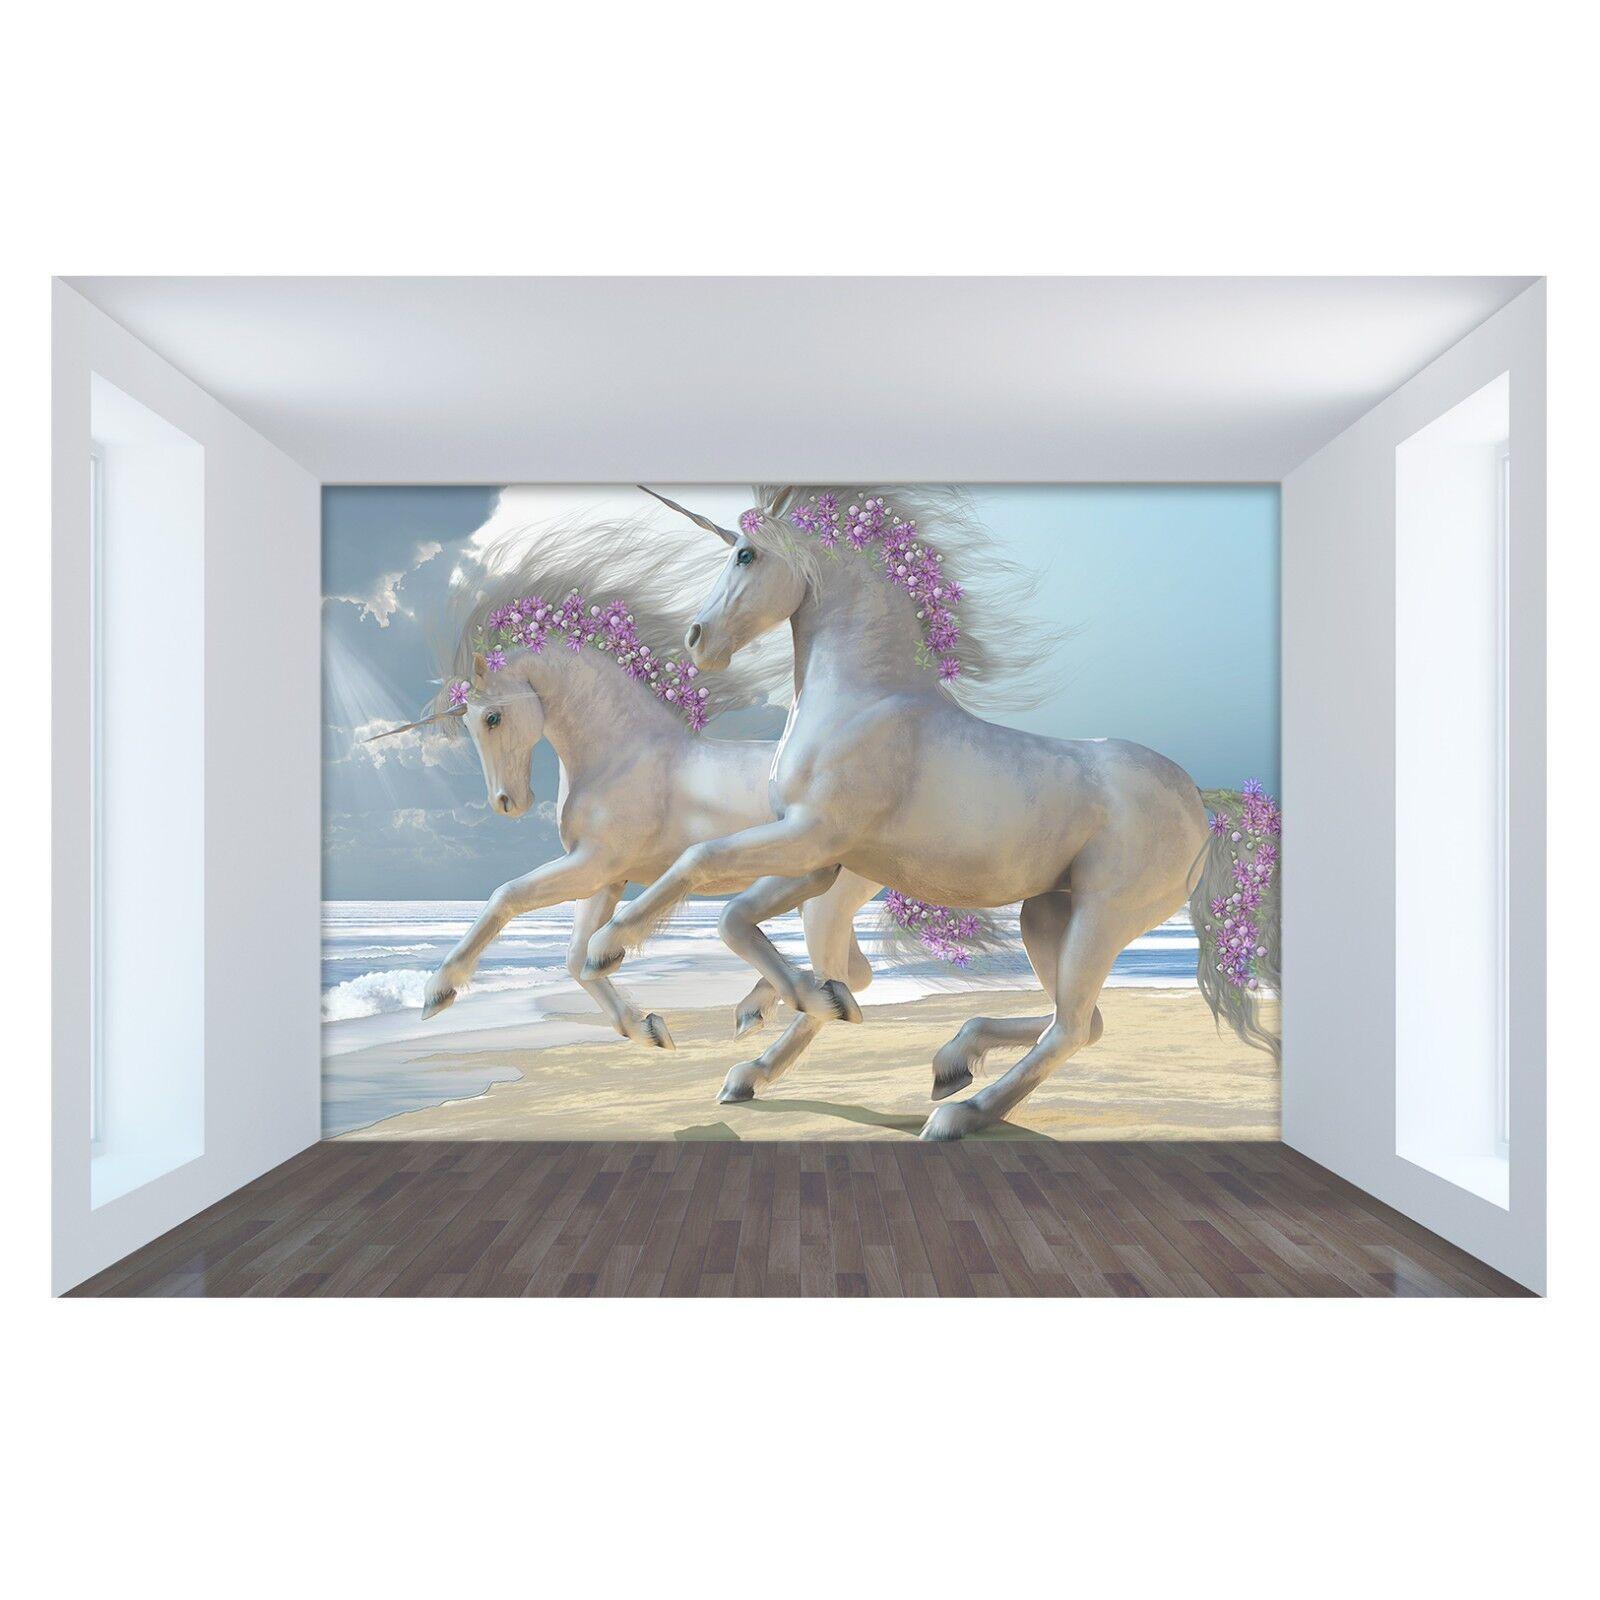 3D 3D 3D Beautiful Unicorn Sea 8 Wallpaper Mural Print Wall Indoor Wallpaper Murals UK 0dbb36